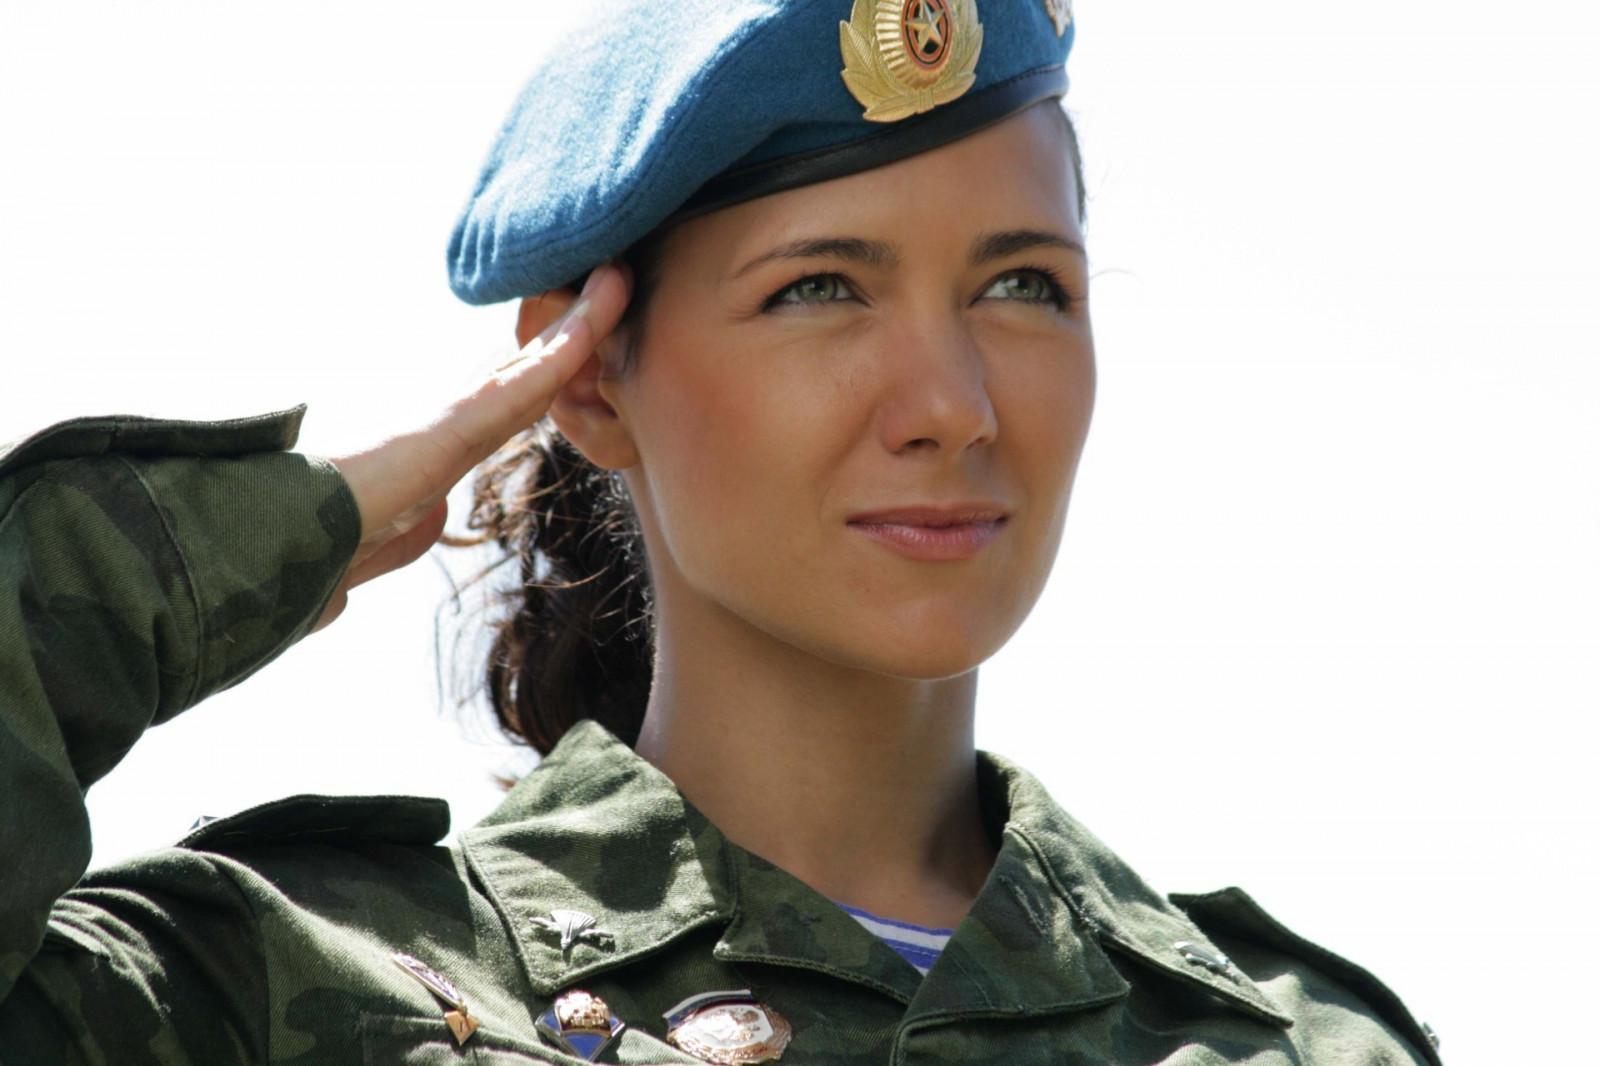 Wallpaper Women Soldier Army Person Clothing Jockey